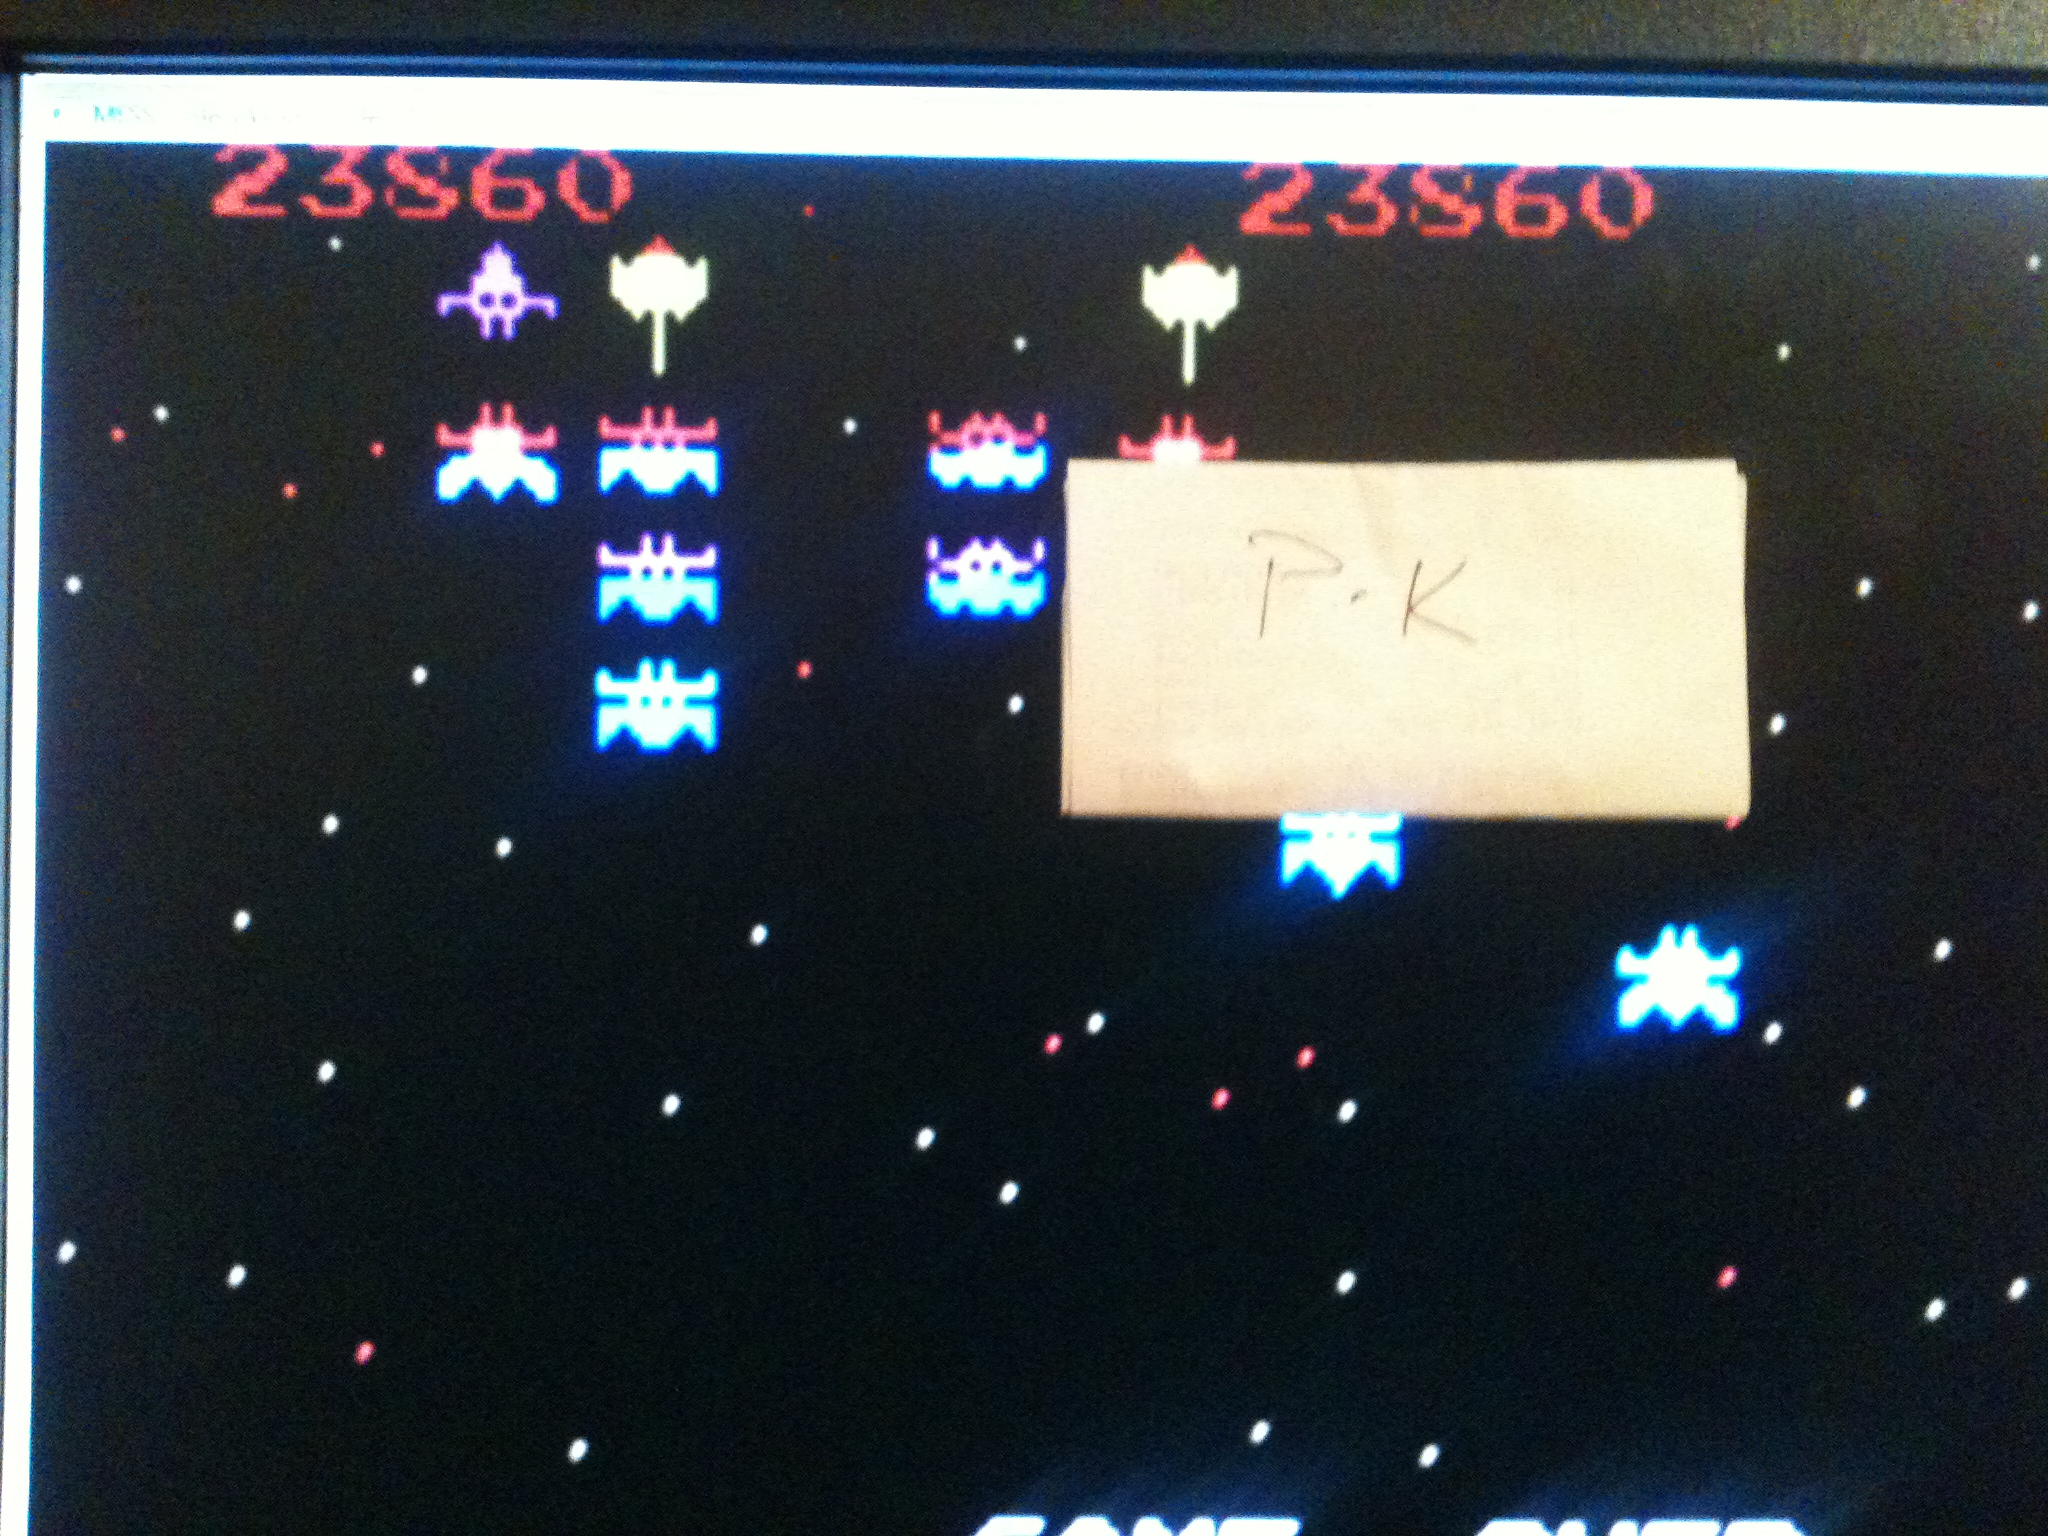 Galaxian: Novice 23,860 points